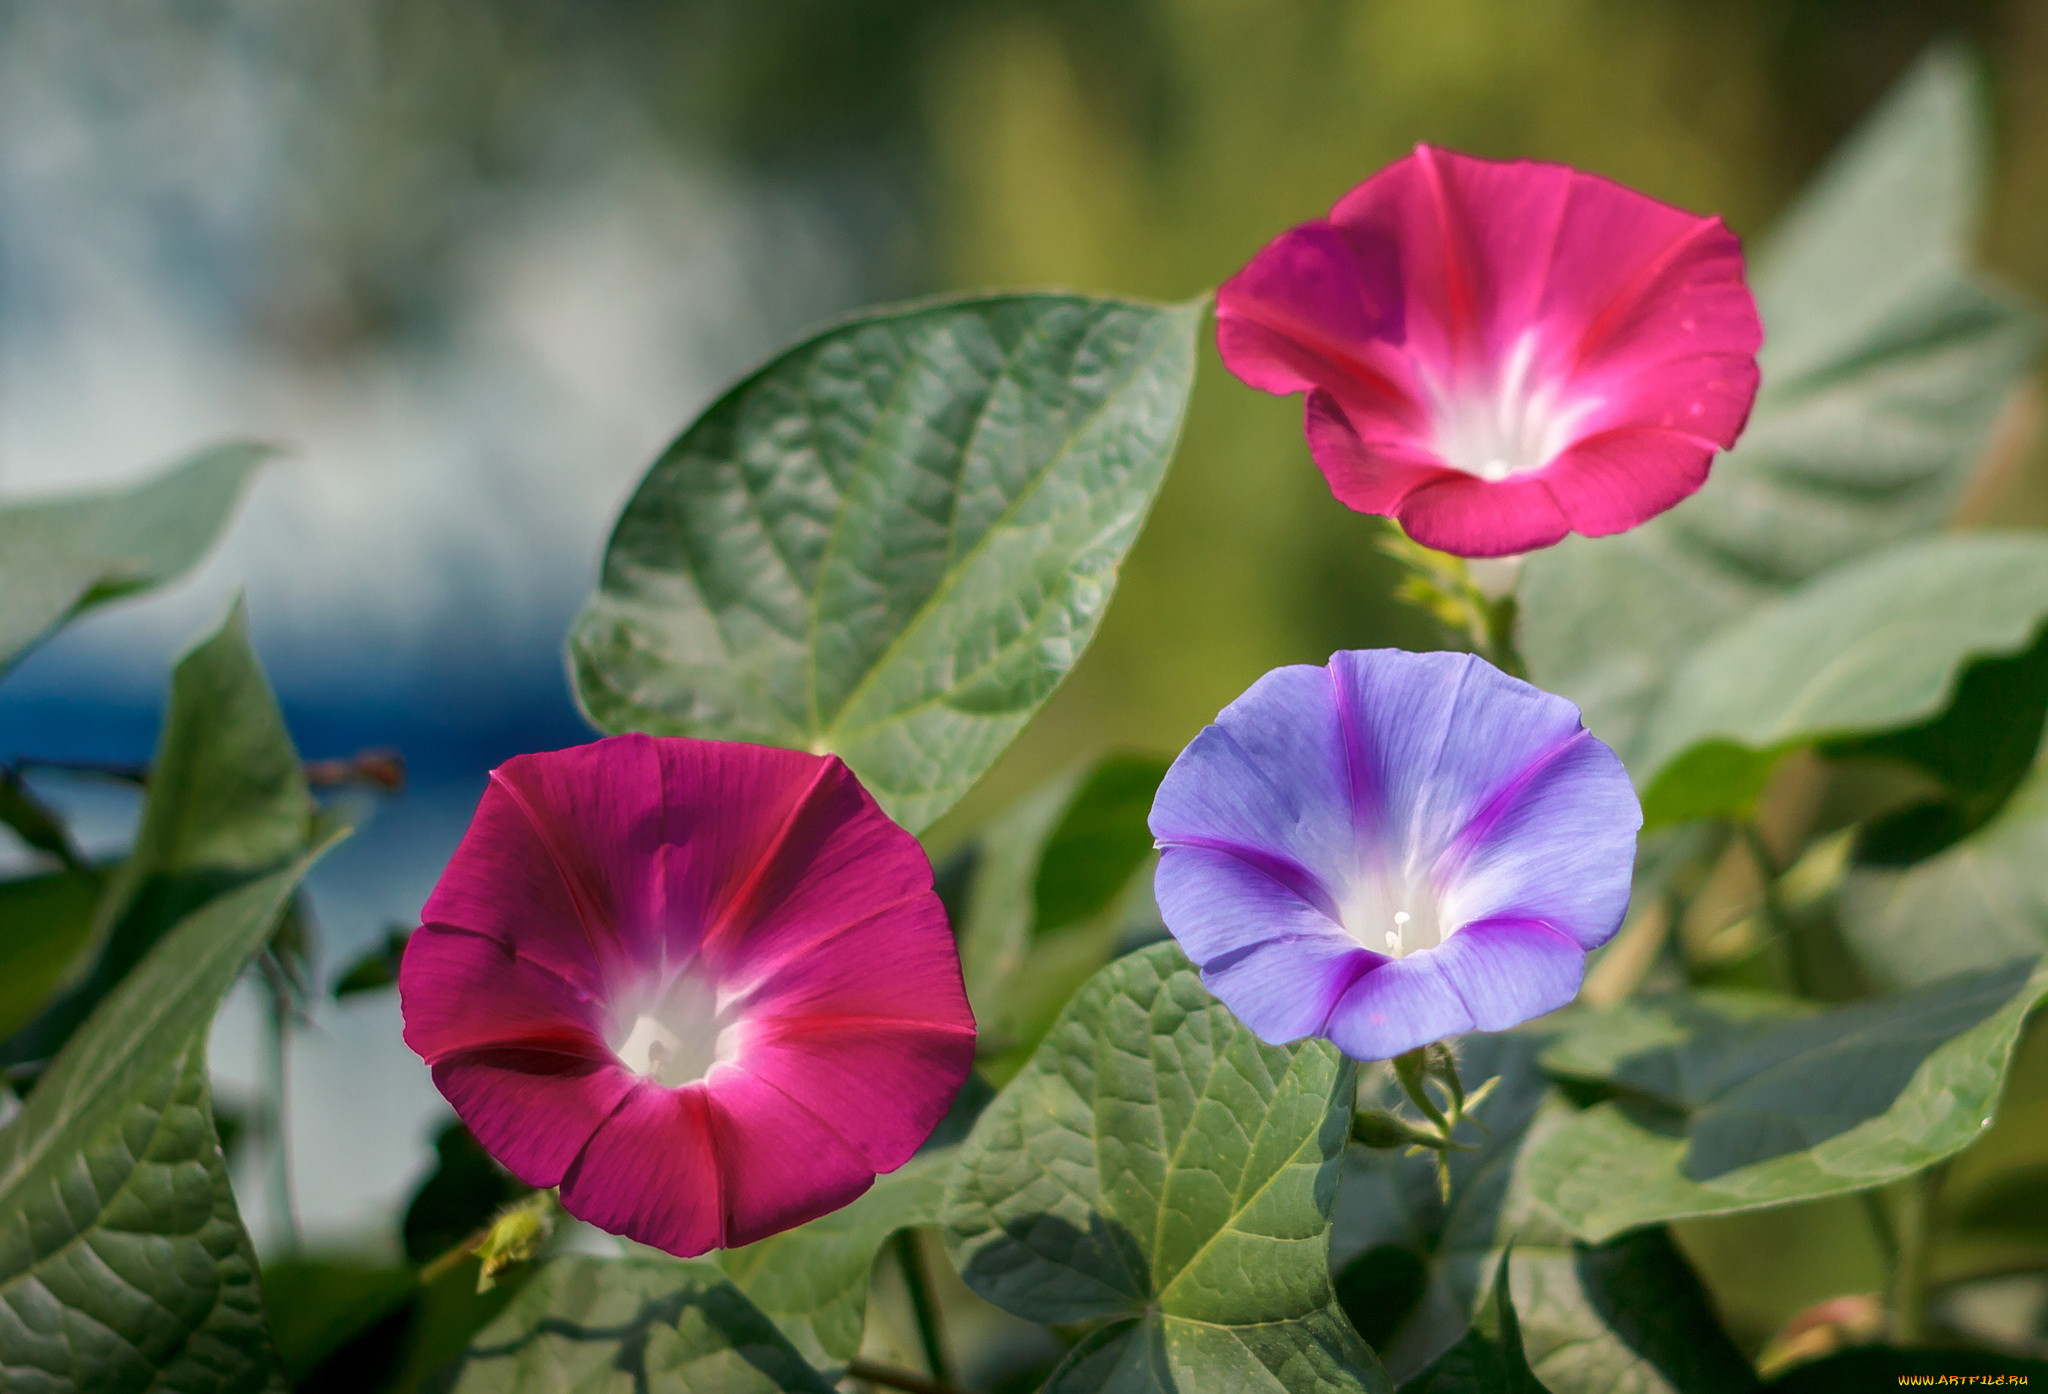 хуп картинки цветка вьюн затратите минимум, процесс